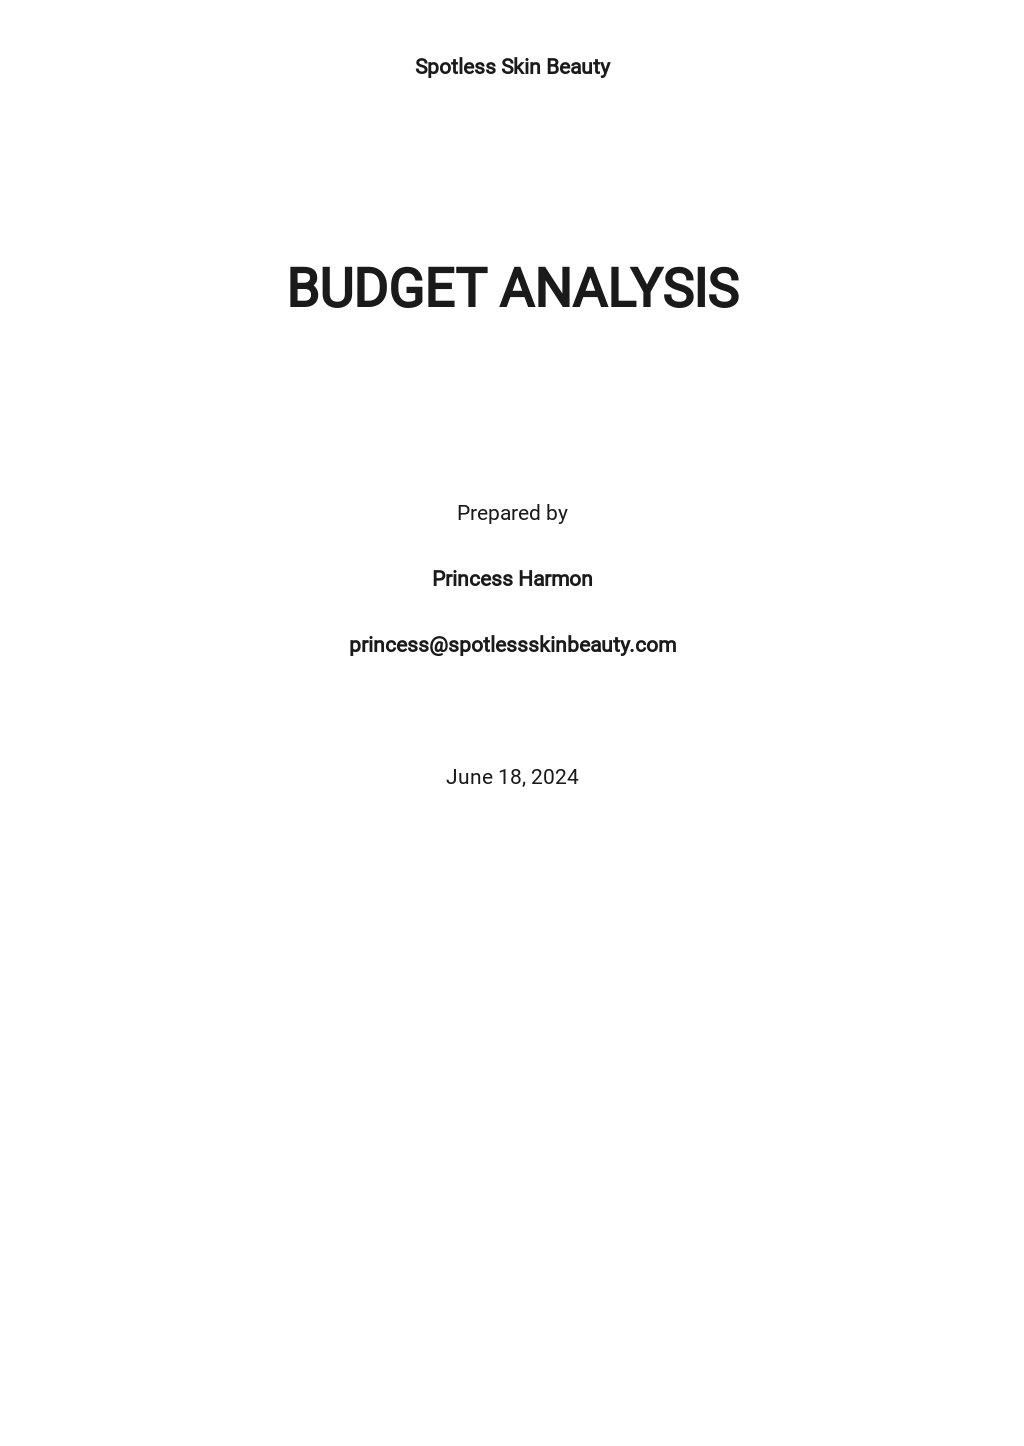 Budget Analysis Template.jpe